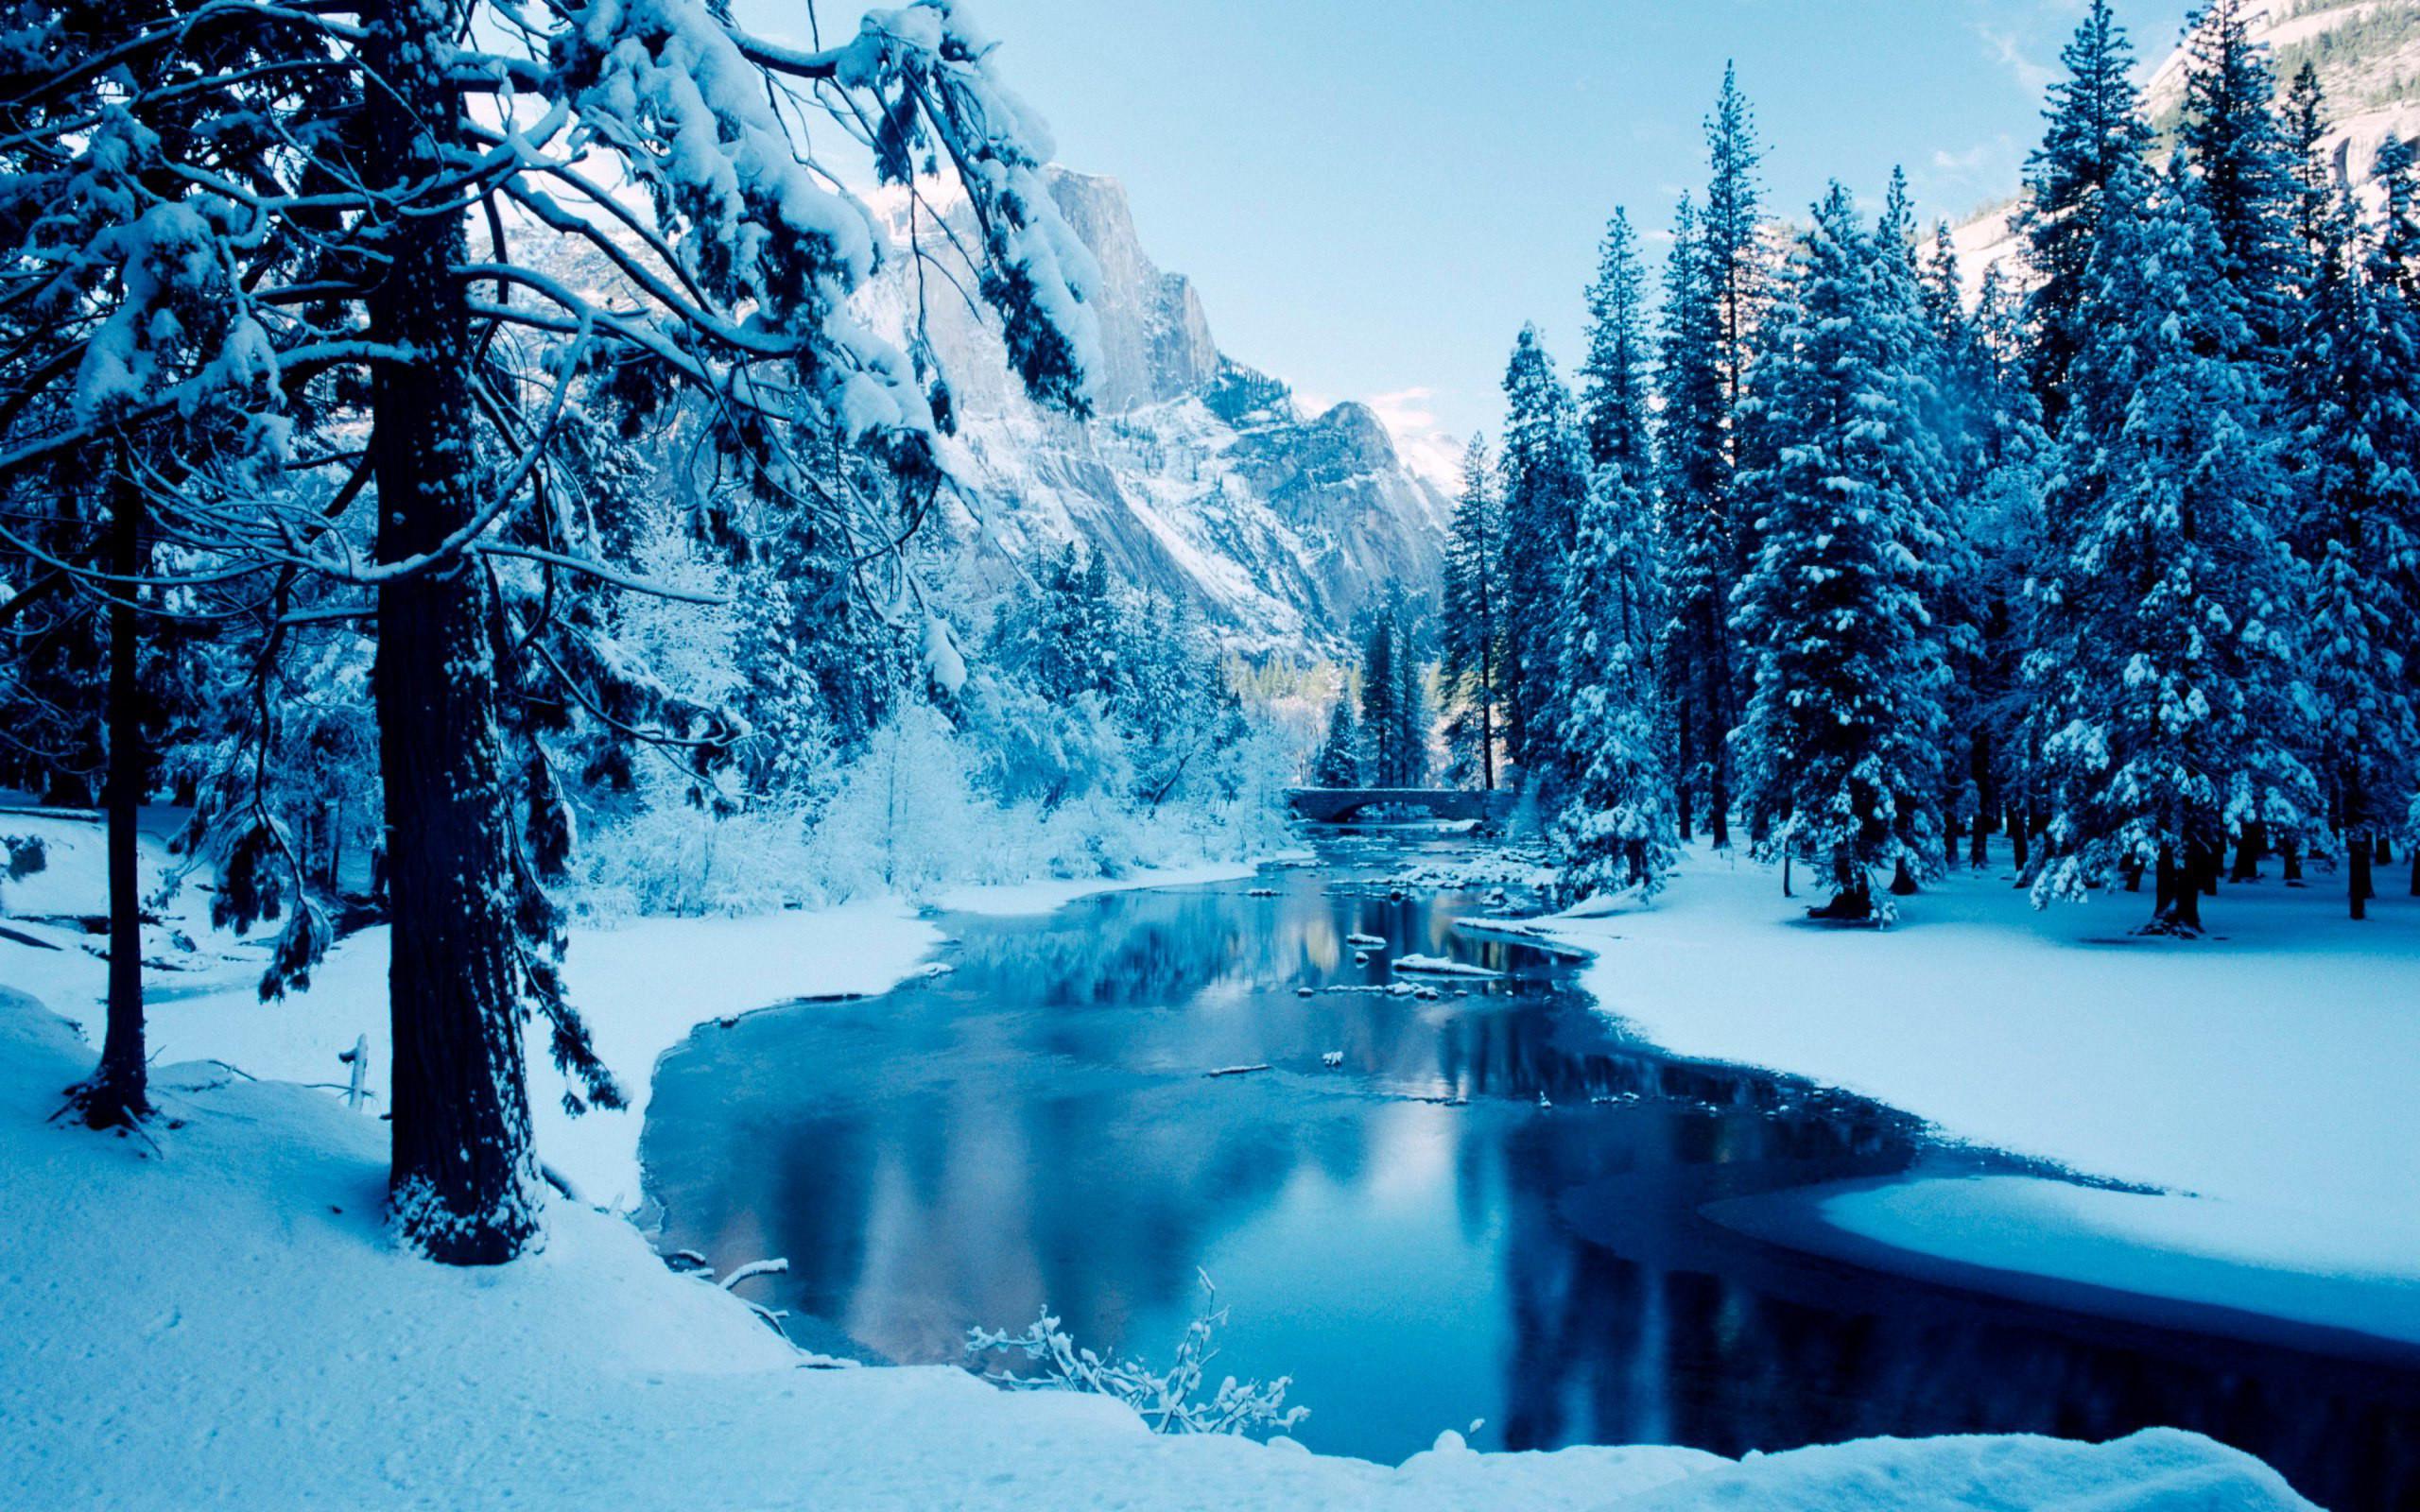 Mountain Snow Scenes Wallpaper (33+ images)